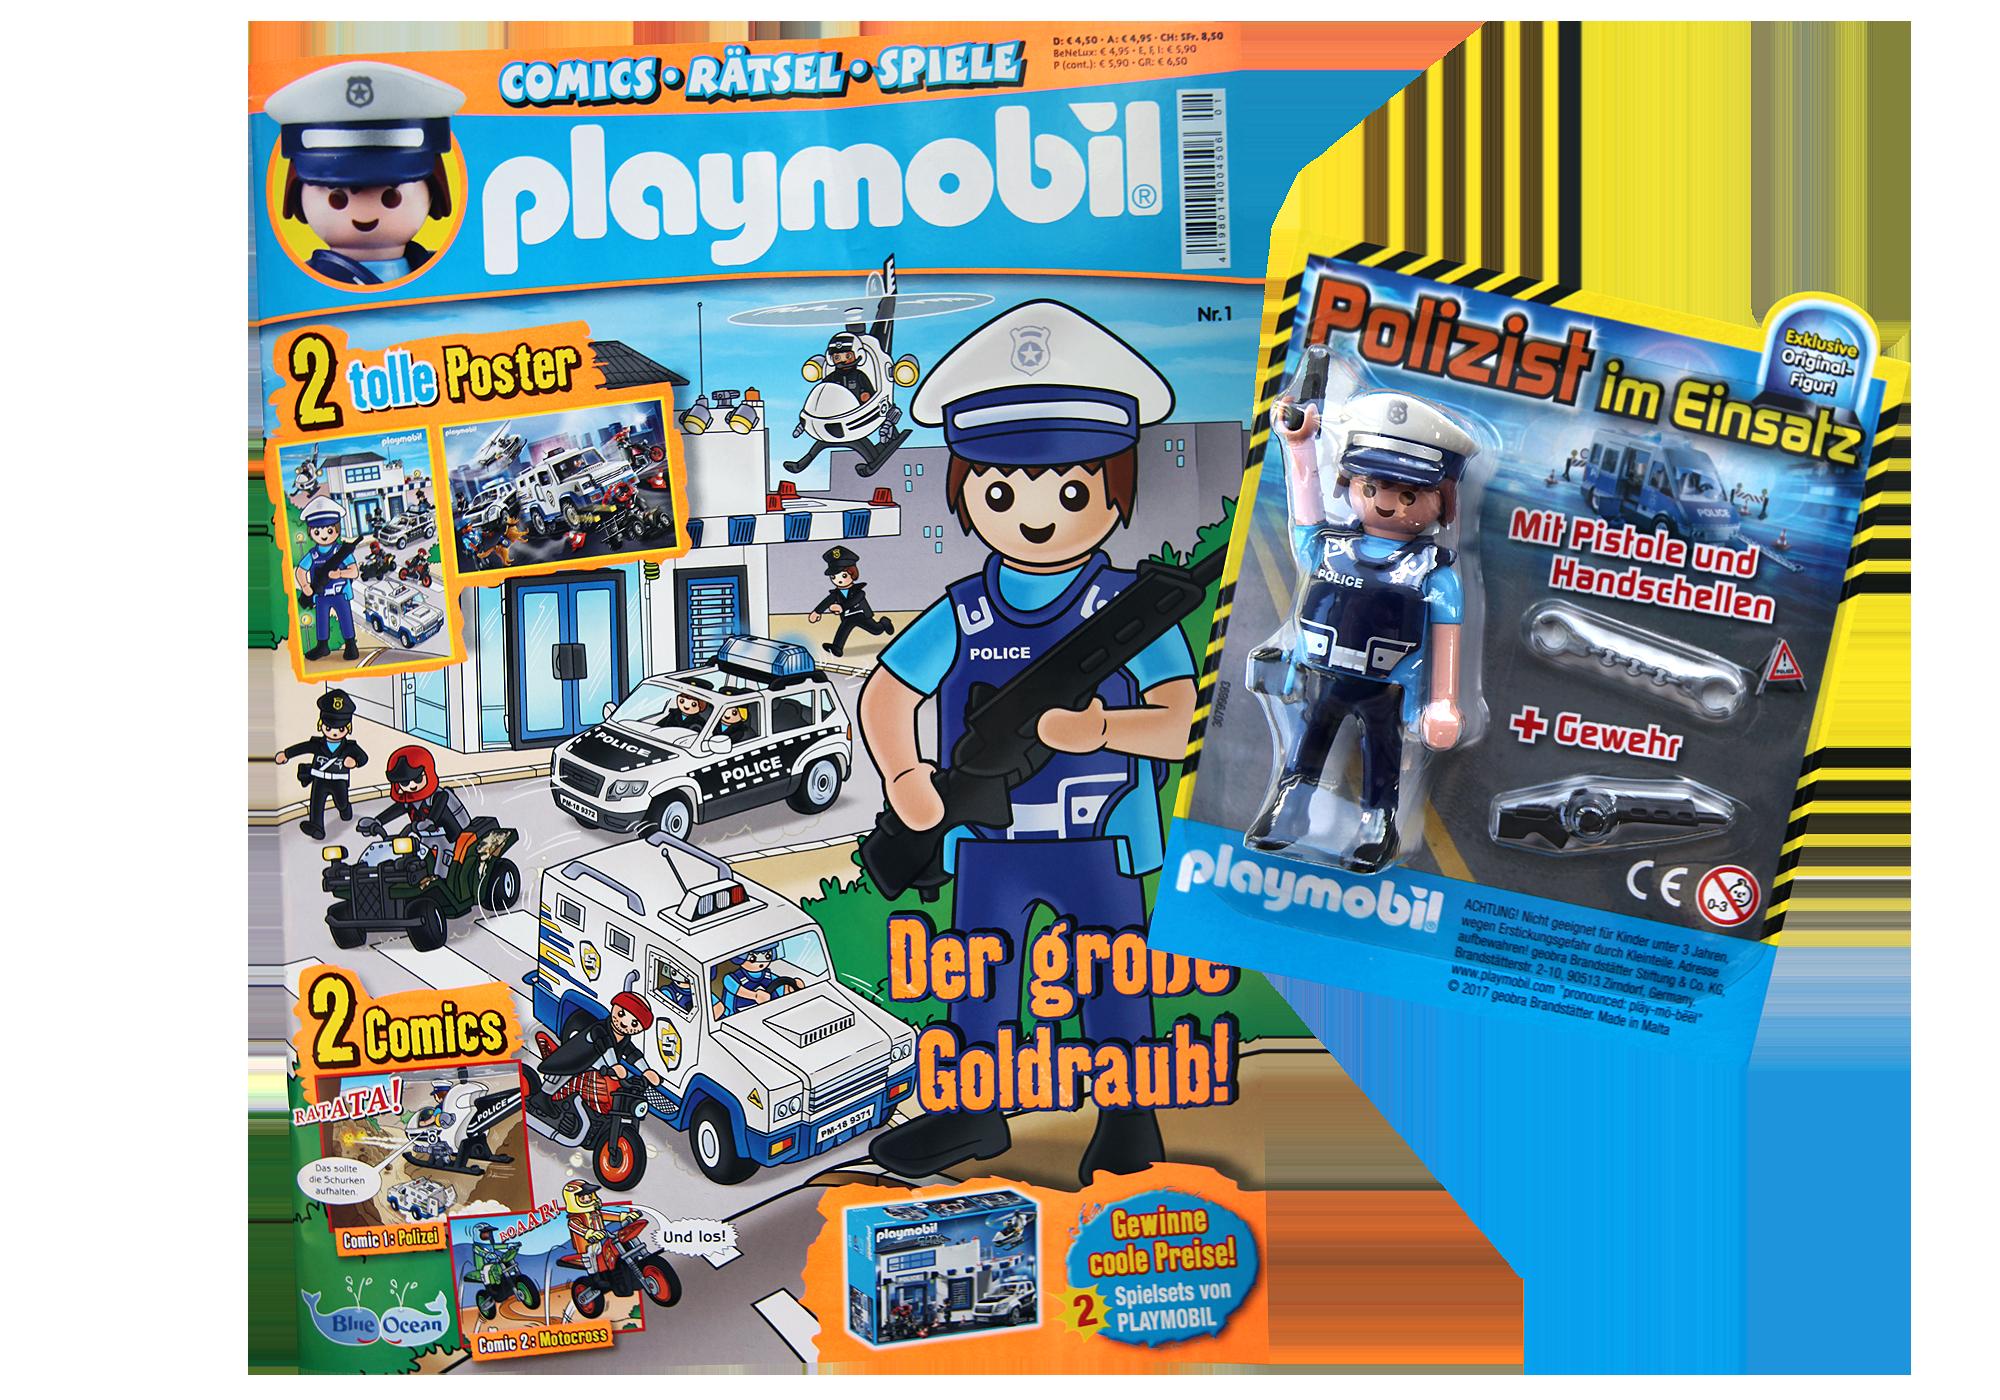 http://media.playmobil.com/i/playmobil/80600_product_detail/PLAYMOBIL-Magazin 1/2018 (Heft 58)